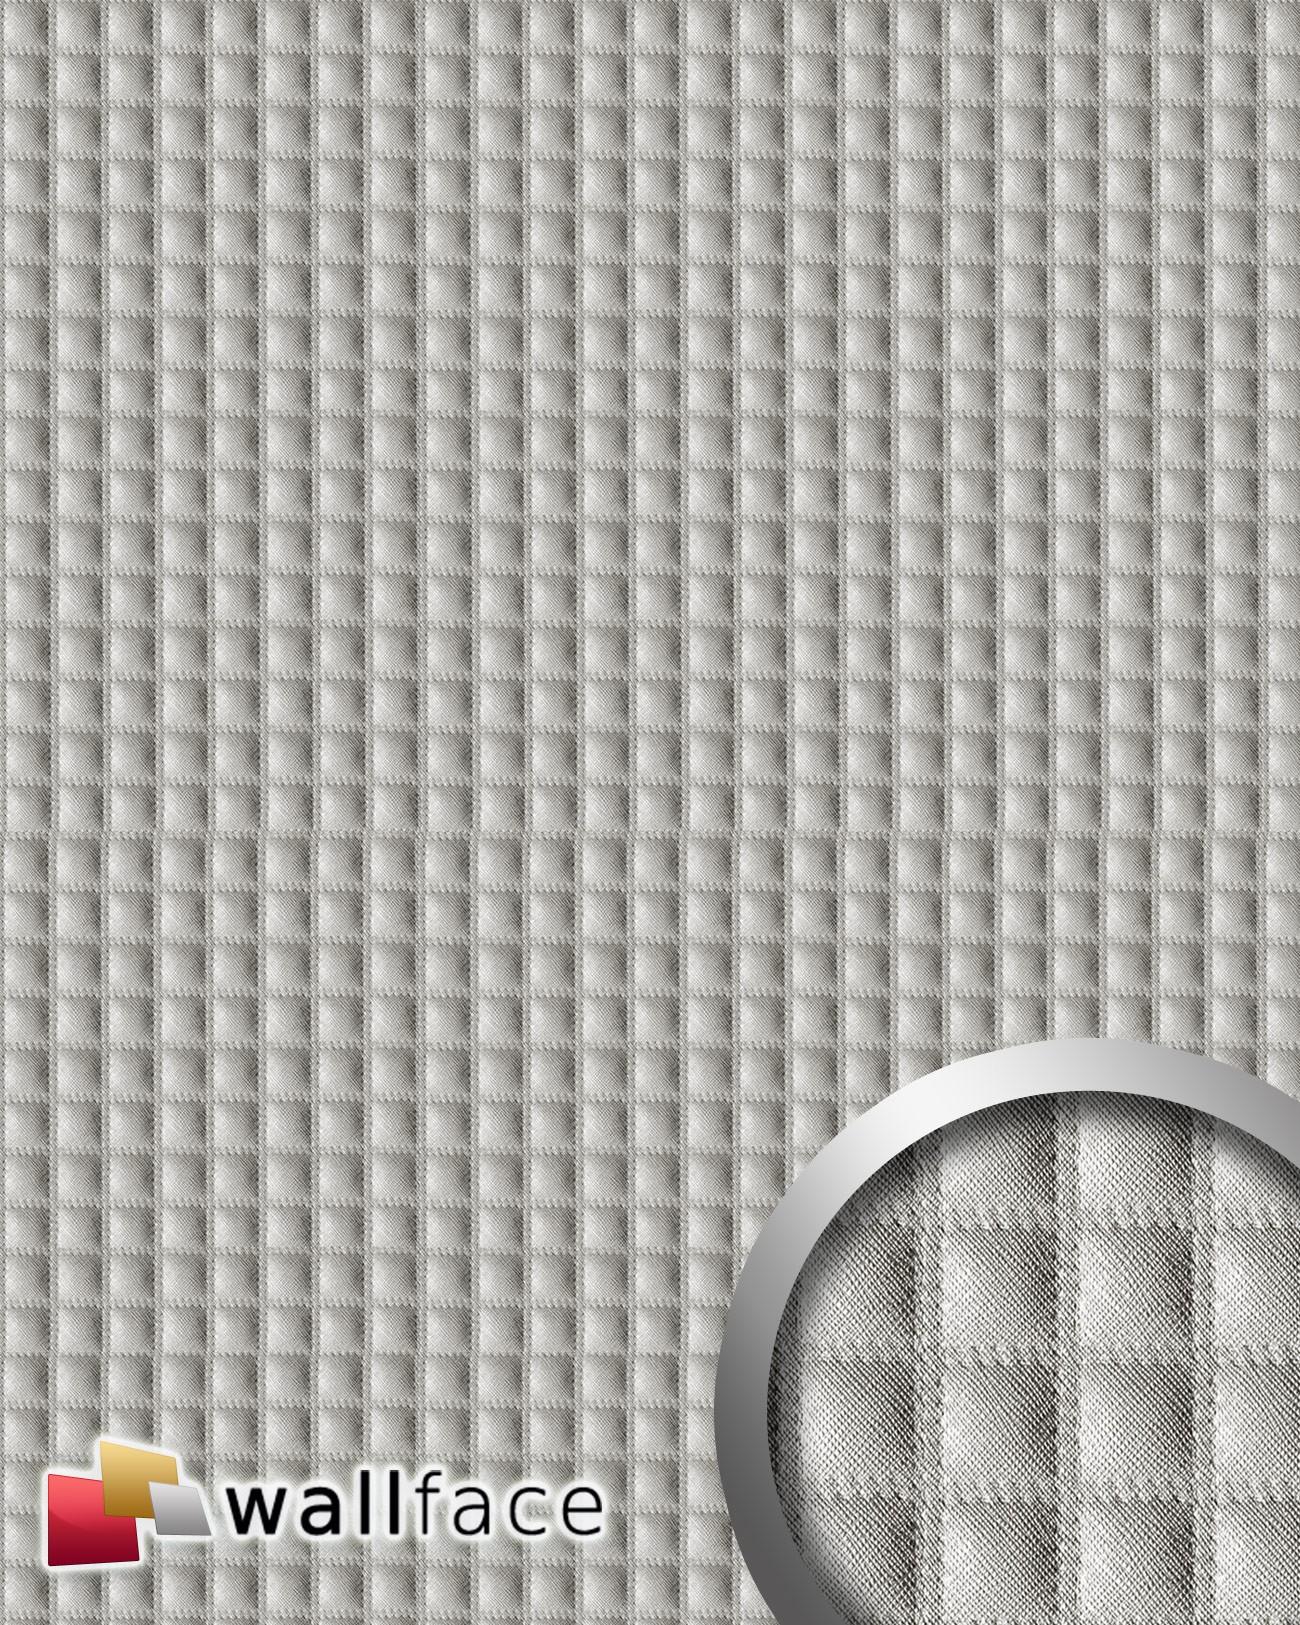 Panou Decorativ Leather 16422  Wallface  Autocolan